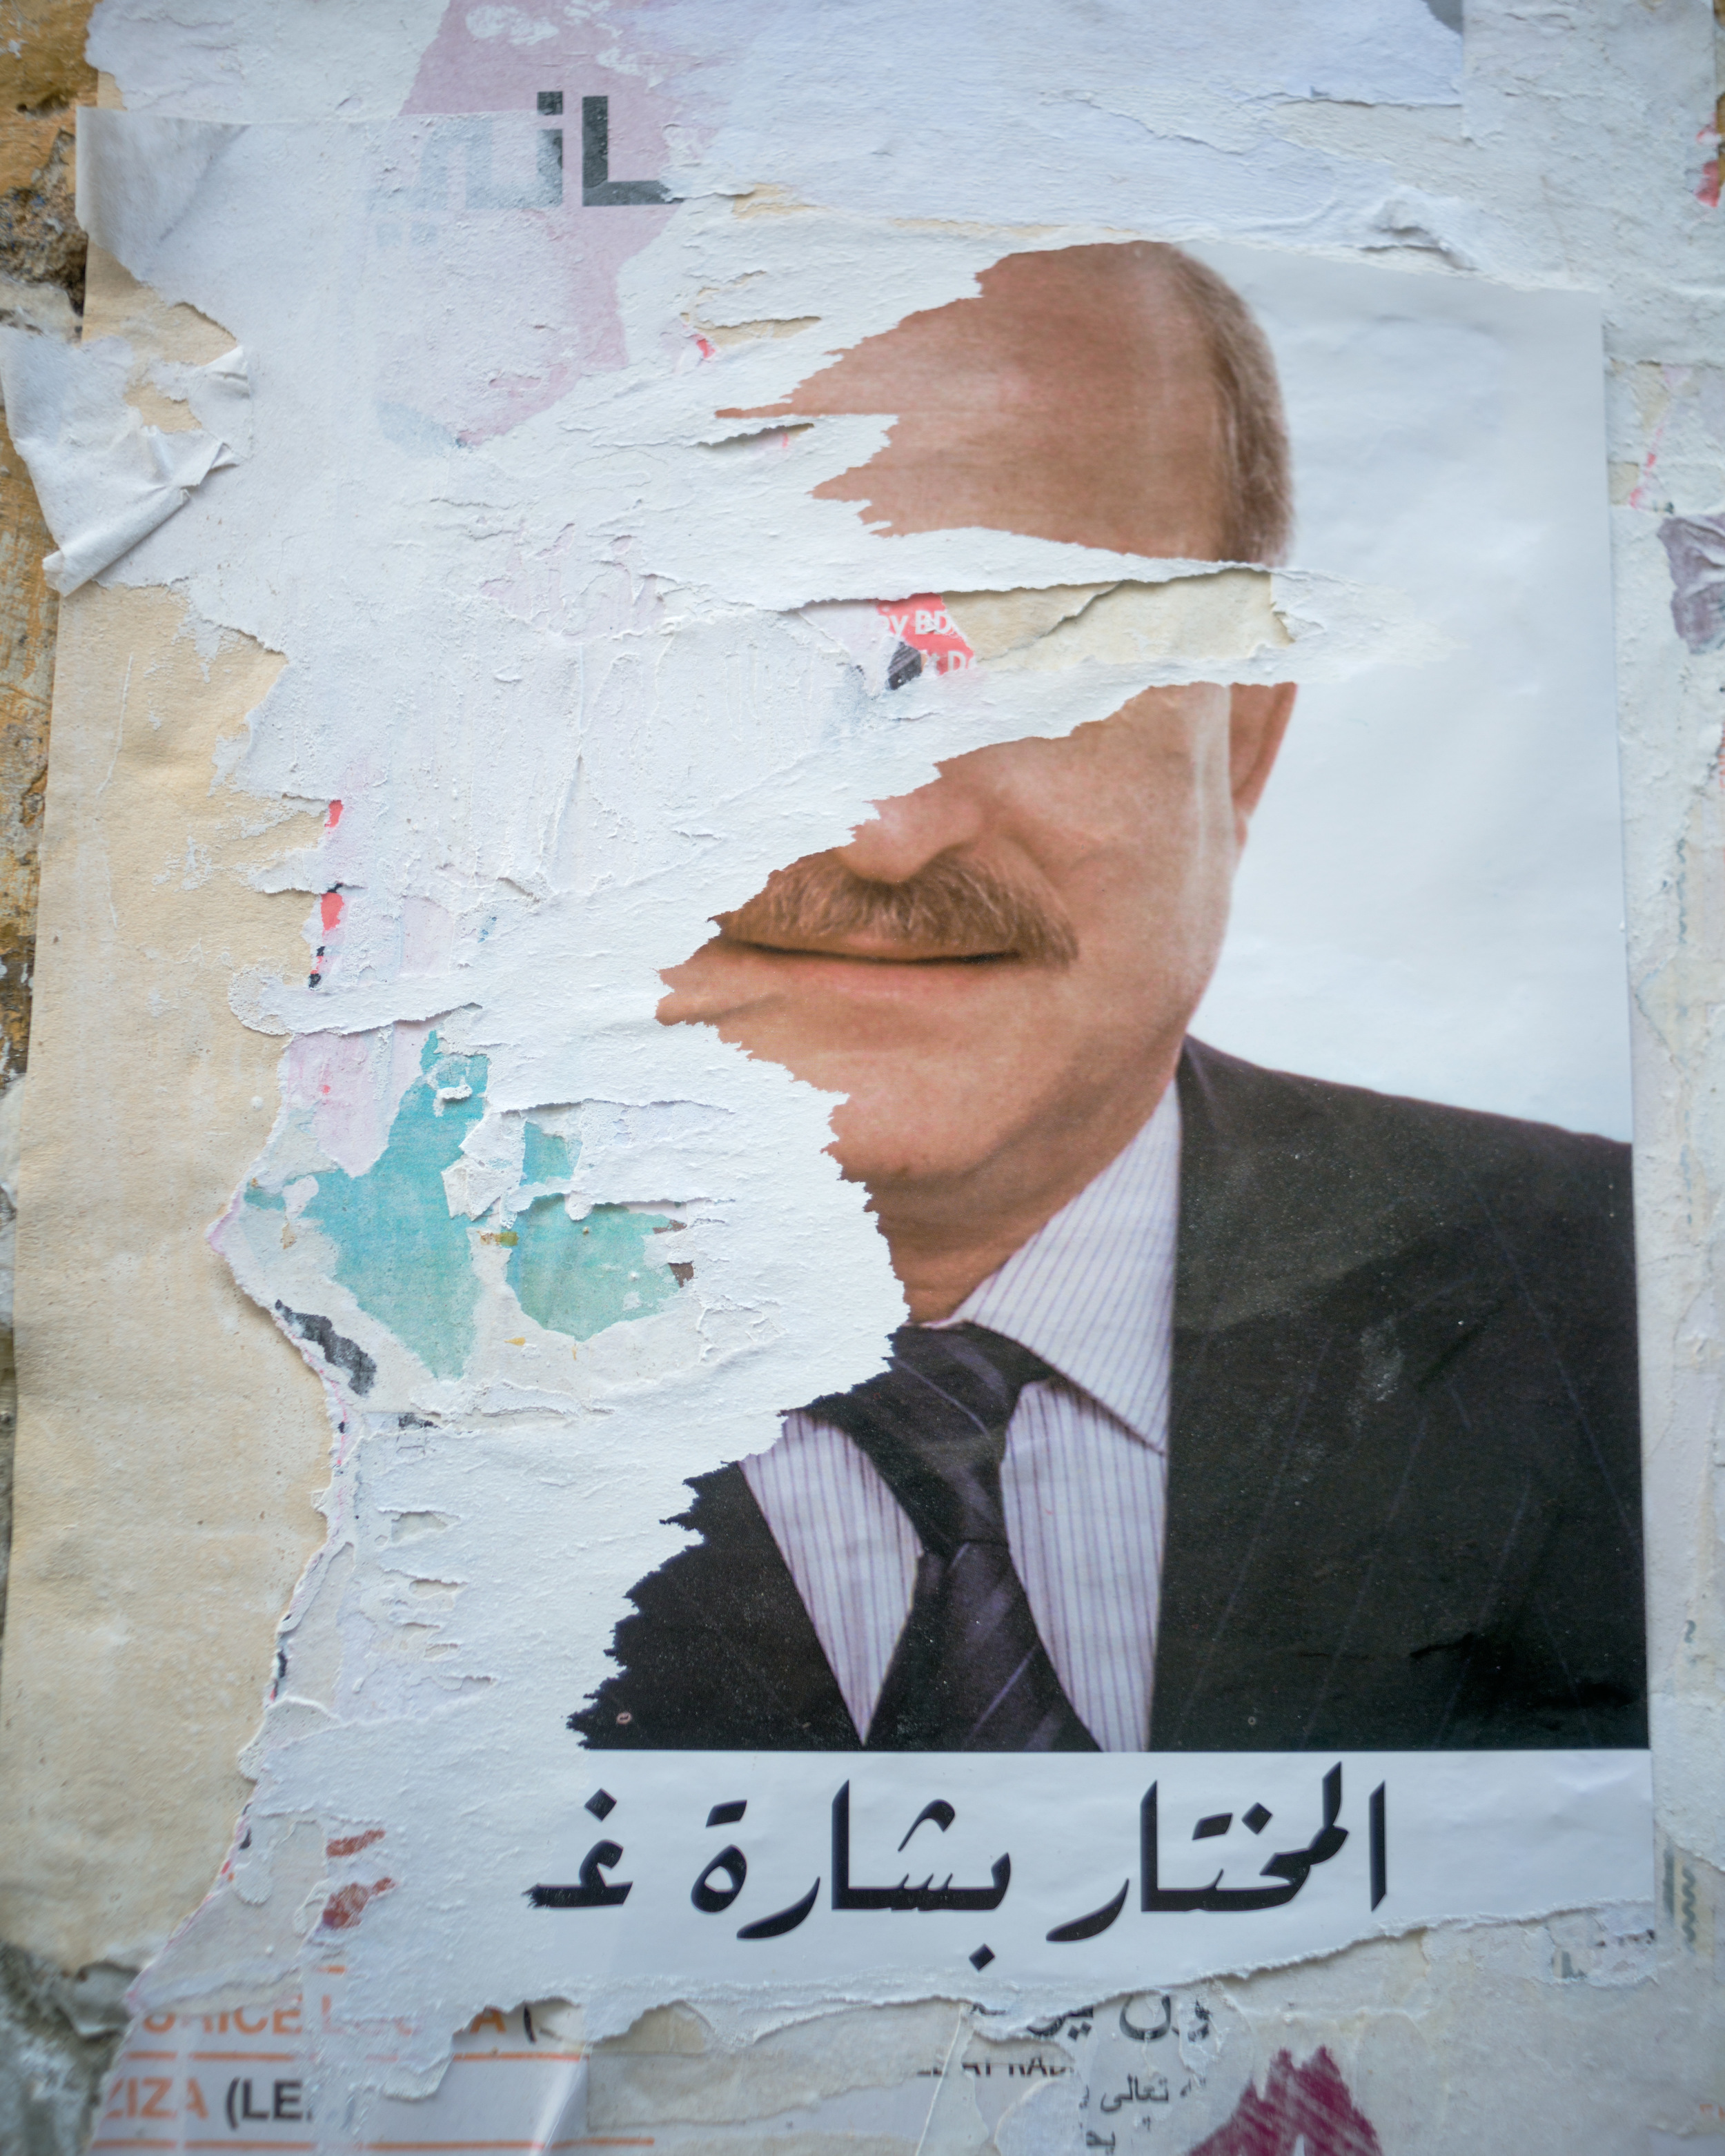 politicianfacepeal2.jpg